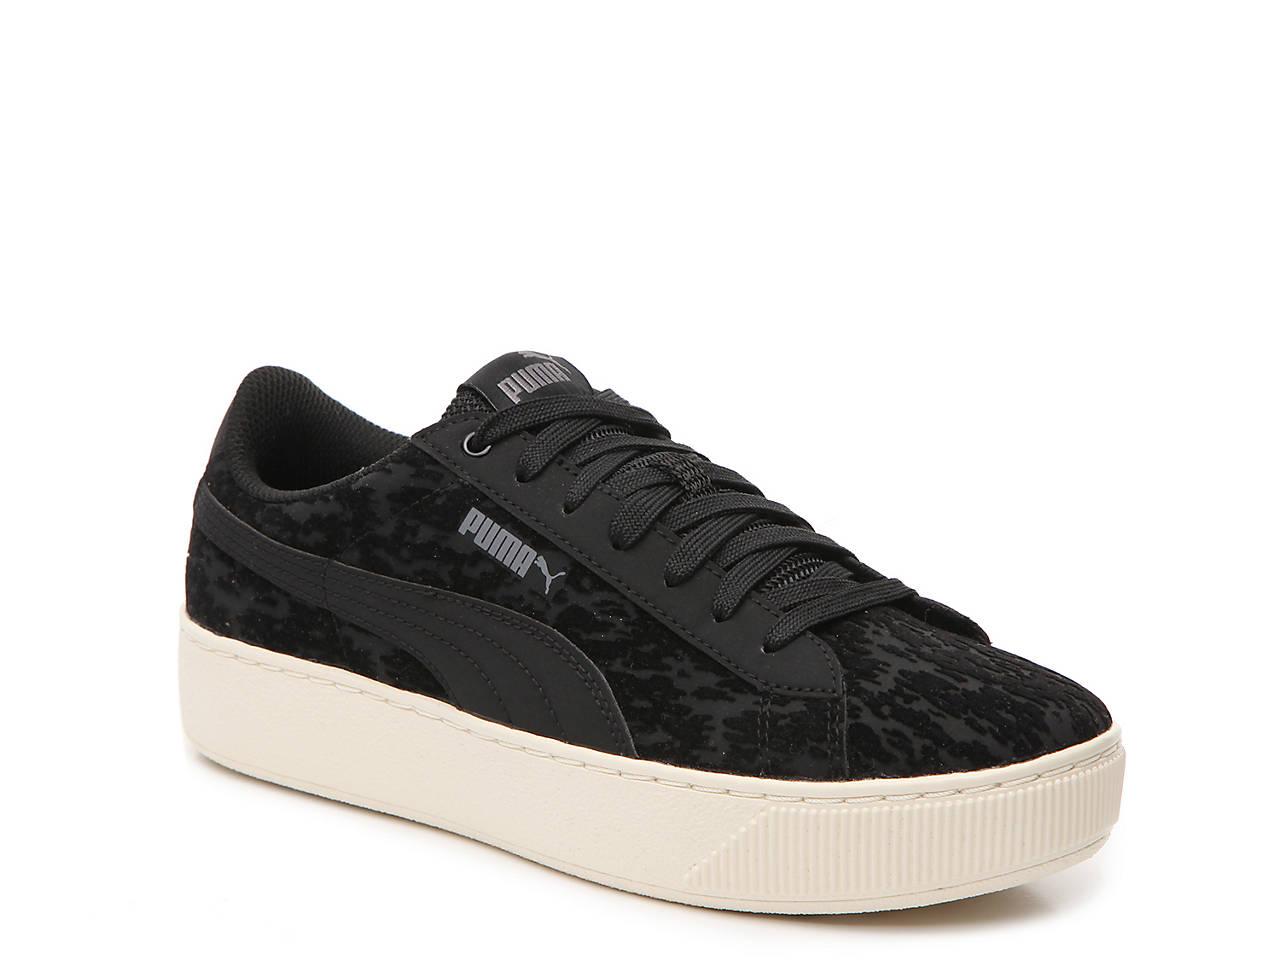 c28c66eefc82 Puma Vikky Velvet Platform Sneaker - Women s Women s Shoes